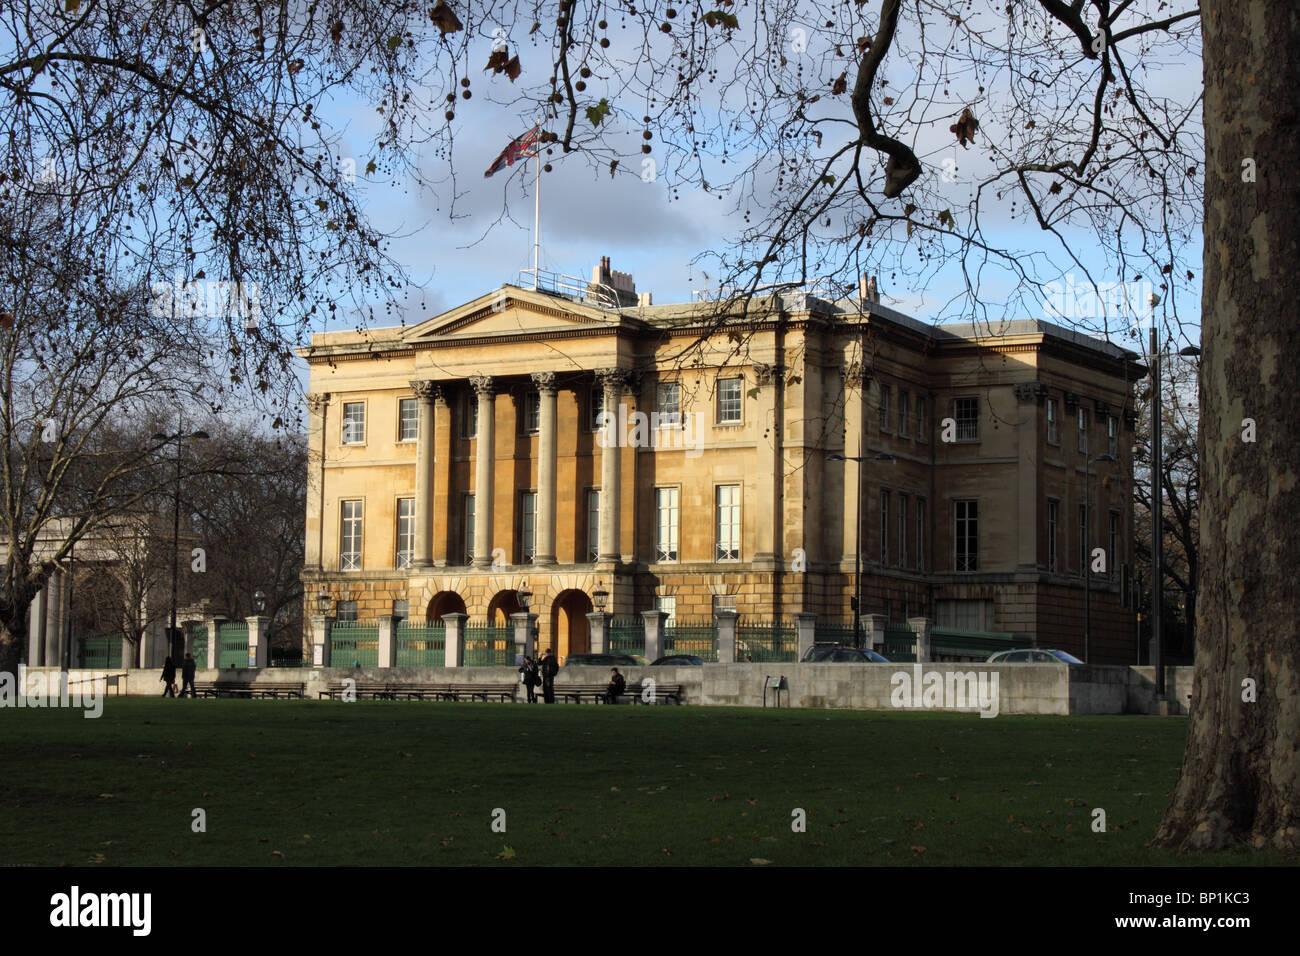 Apsley House, Former home of the Duke of Wellington, Hyde Park Corner, London, UK - Stock Image